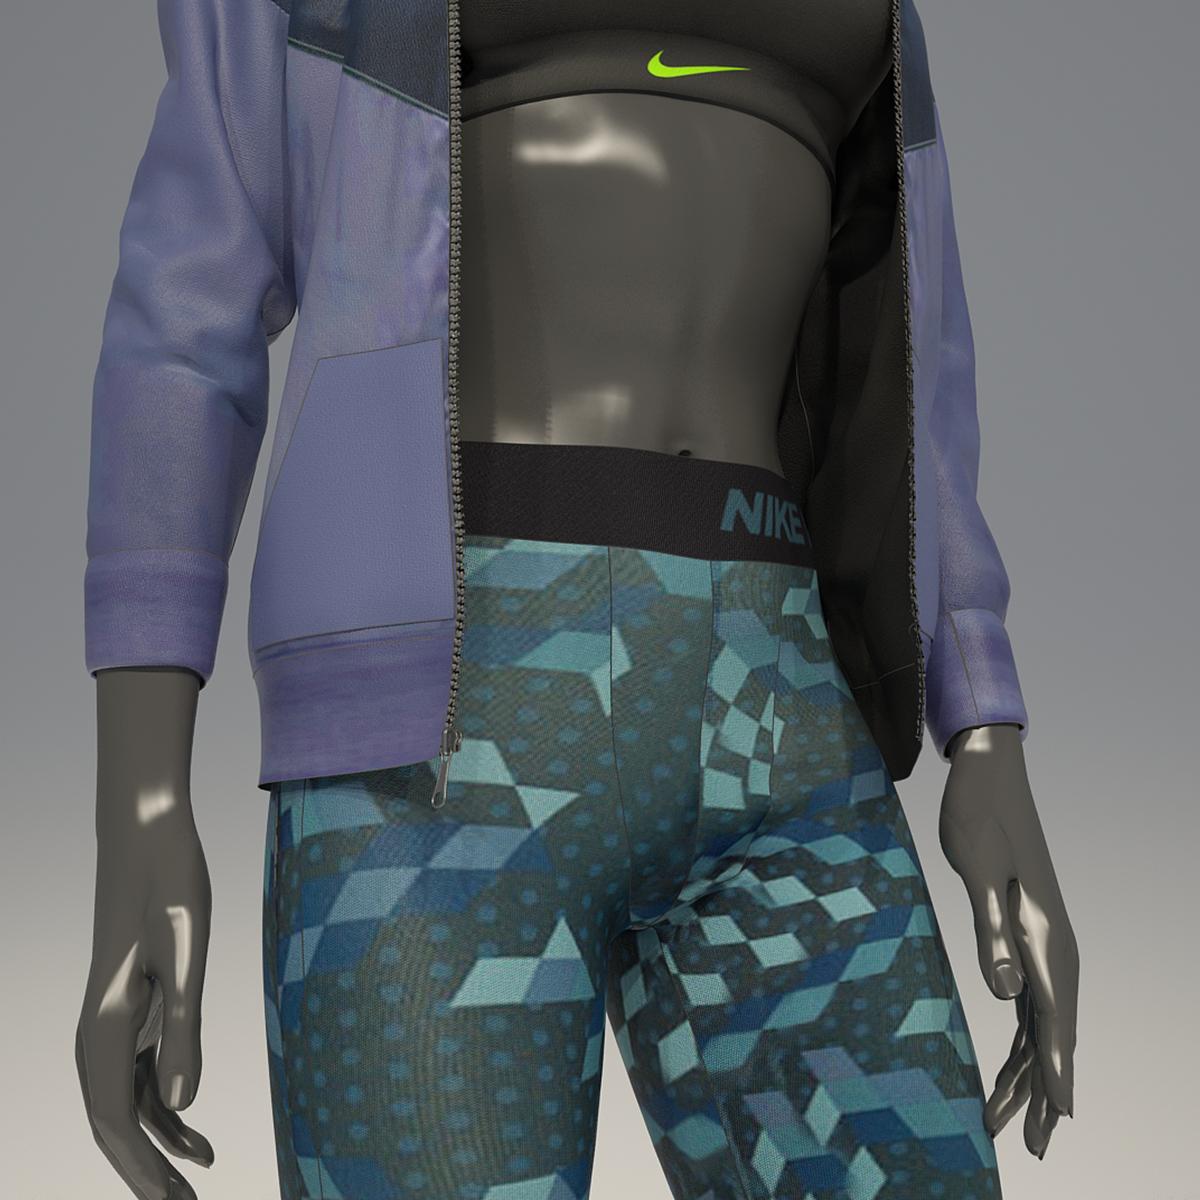 Female Mannequin Nike Pack 2 3d Model By Mrgarret 3docean